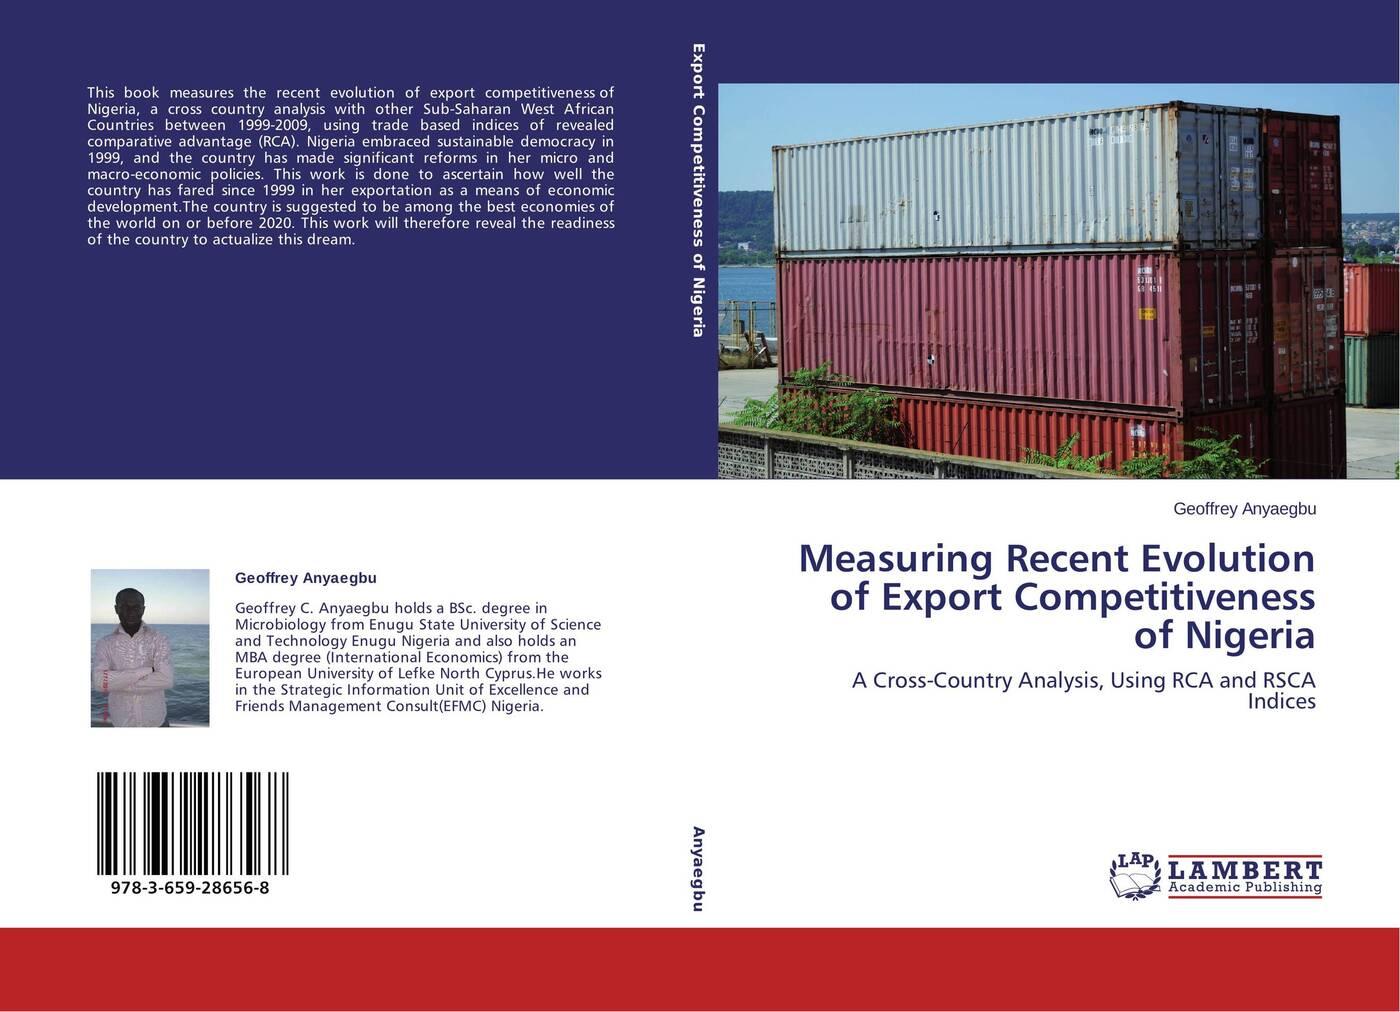 Geoffrey Anyaegbu Measuring Recent Evolution of Export Competitiveness of Nigeria все цены